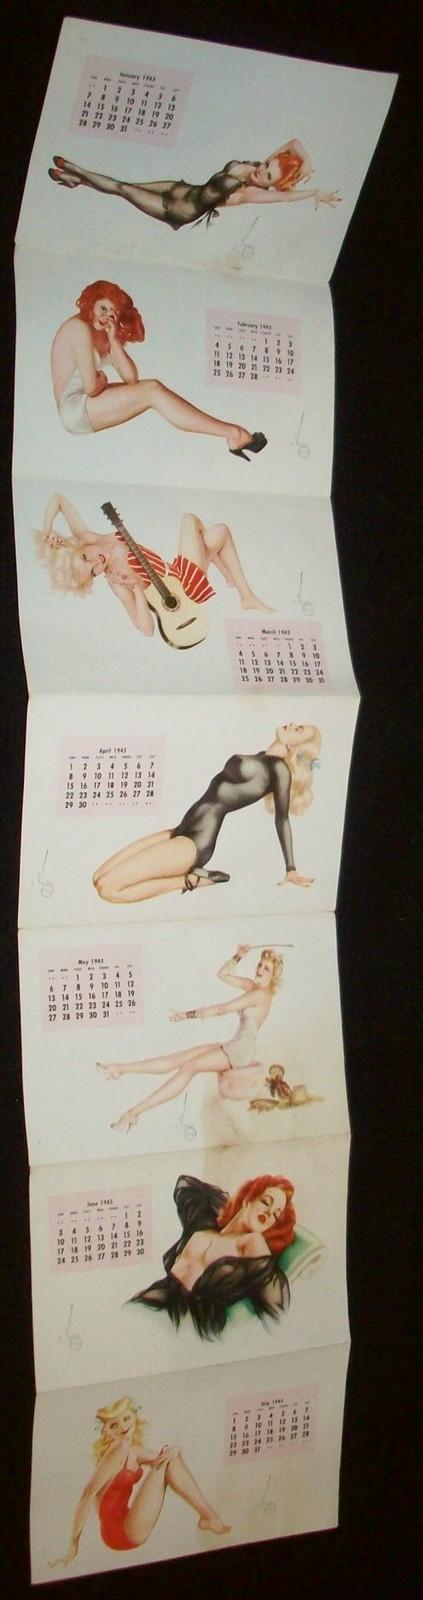 esquire pullout calendar